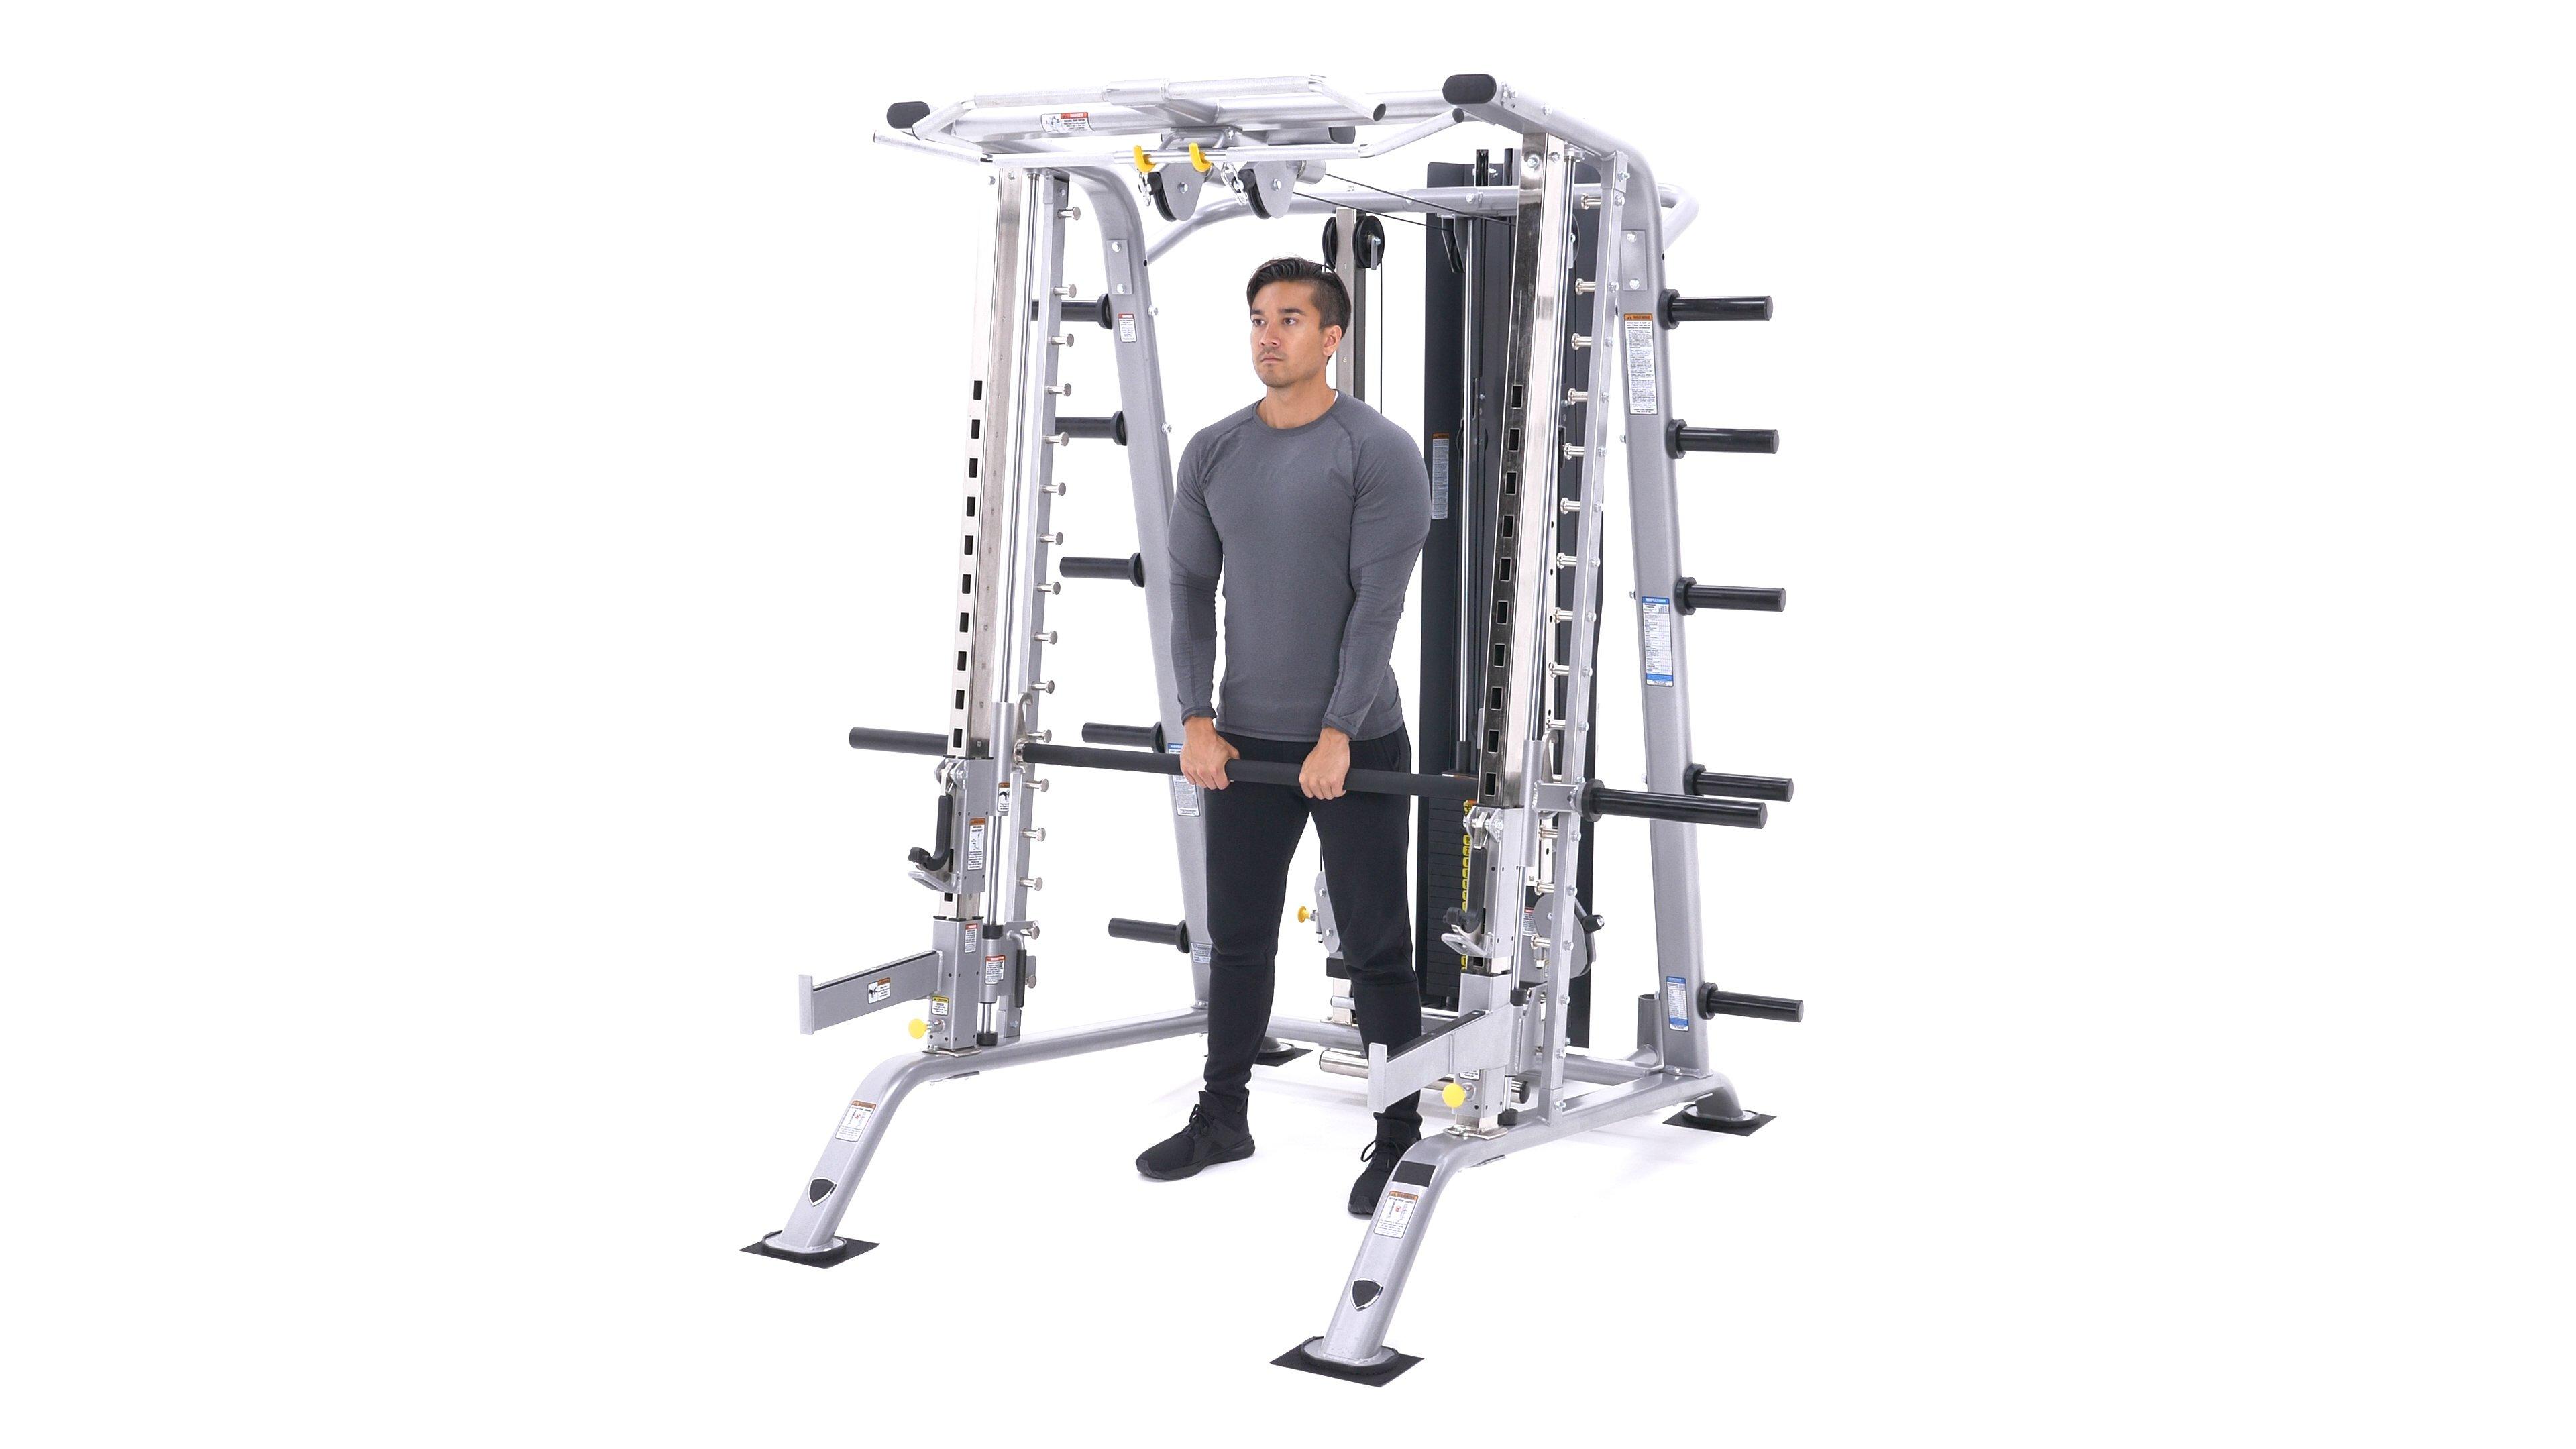 Smith machine upright row image